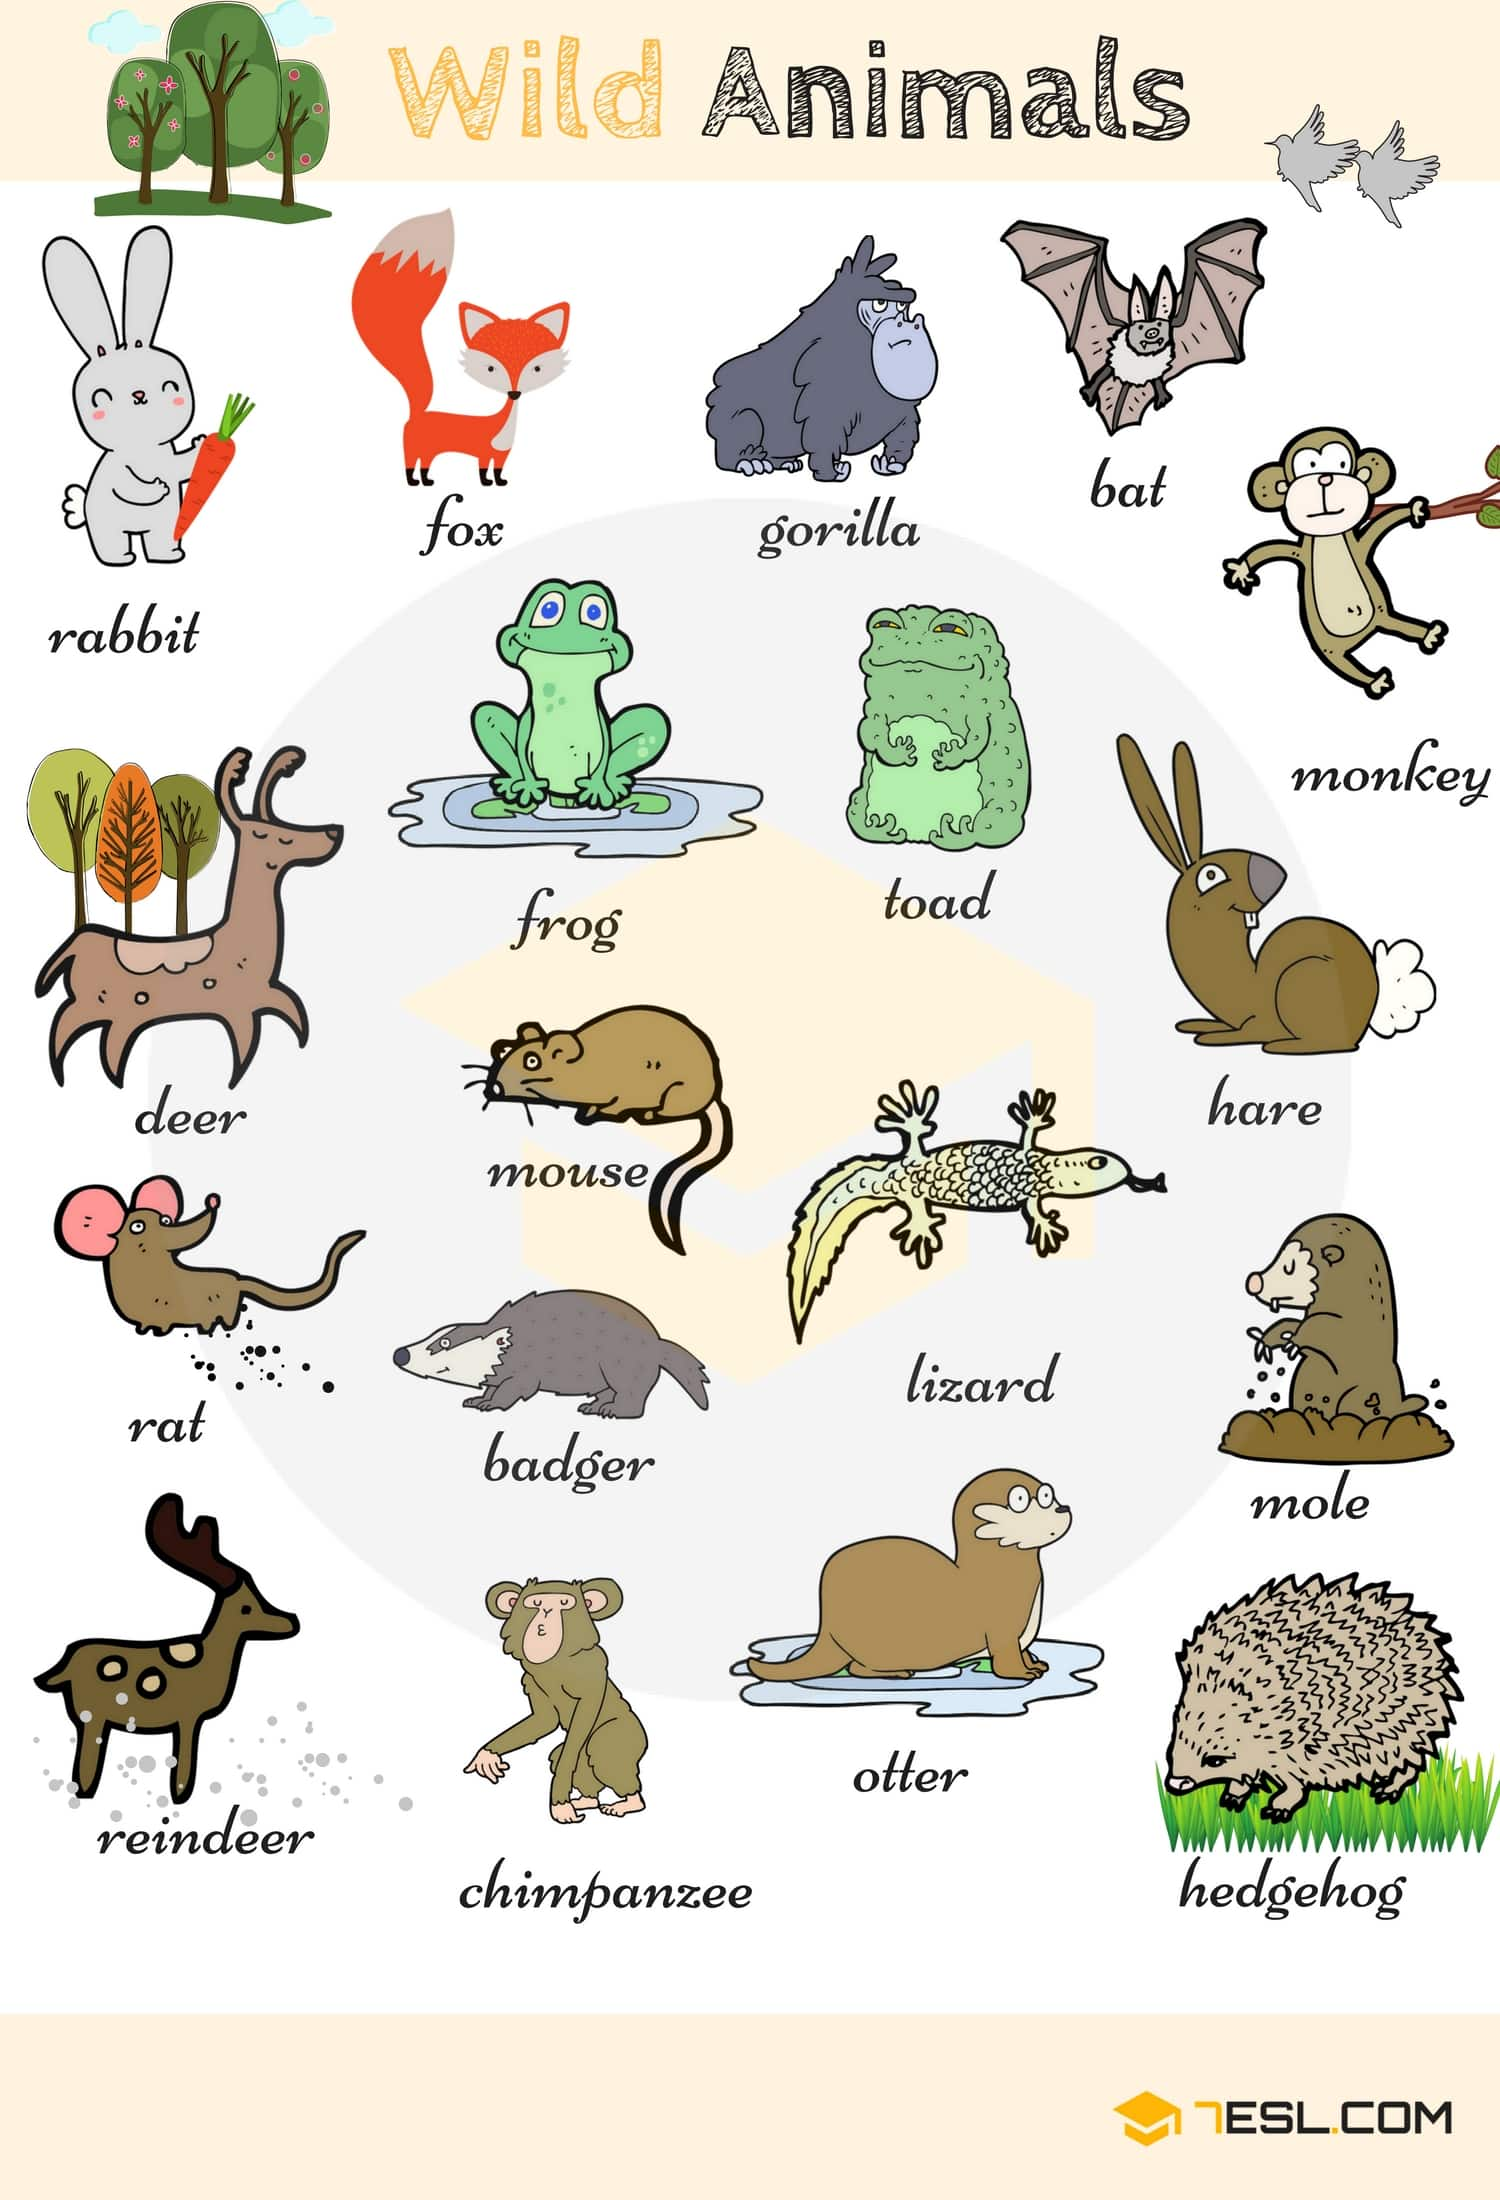 Wild Animal Vocabulary in English 14